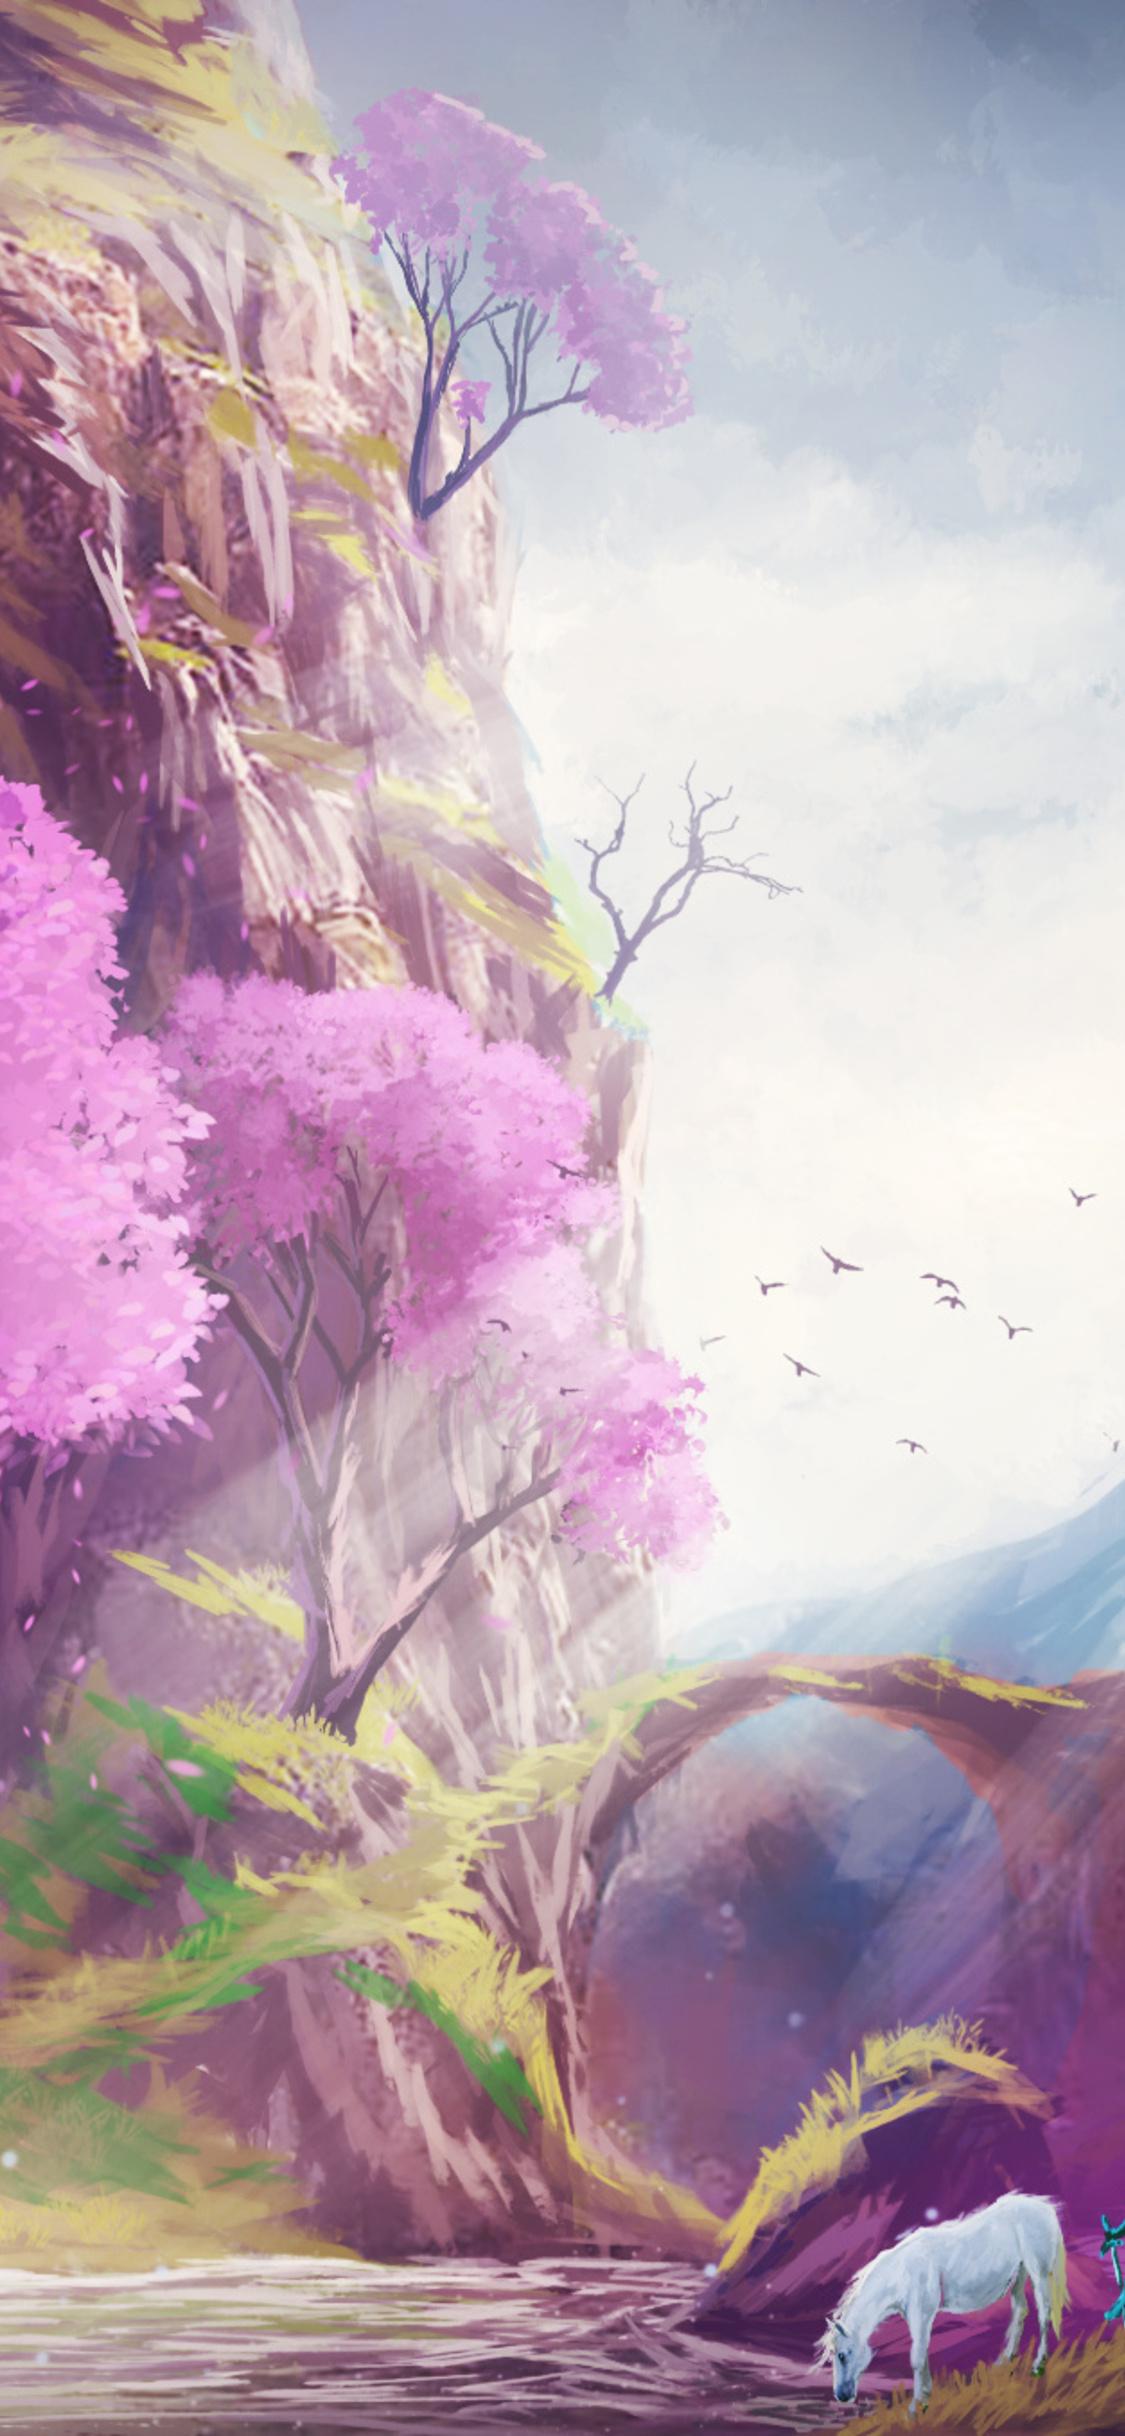 1125x2436 Landscape Fantasy Art Iphone Xs Iphone 10 Iphone X